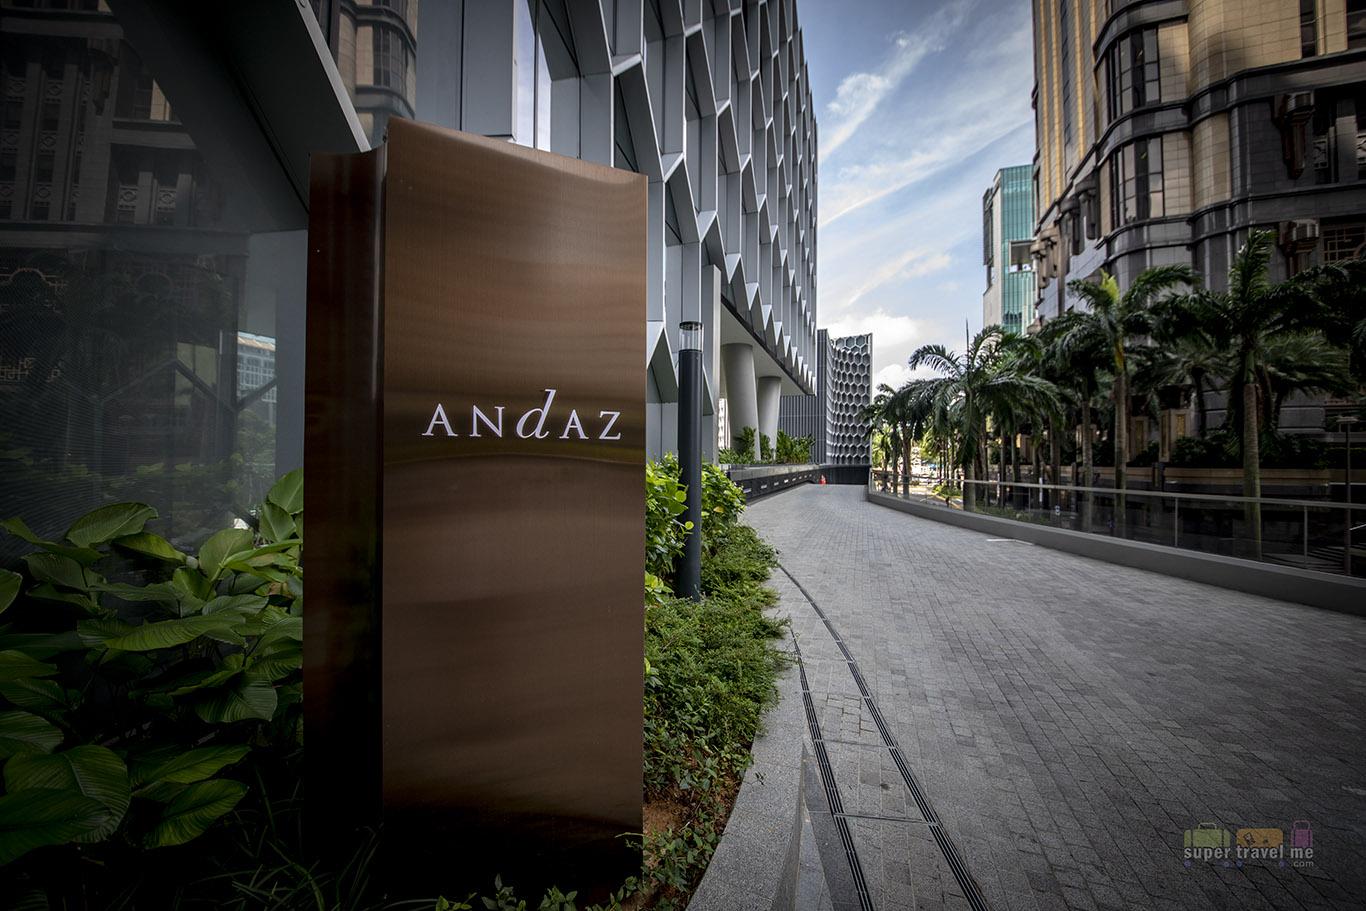 Andaz Hotels & Resorts